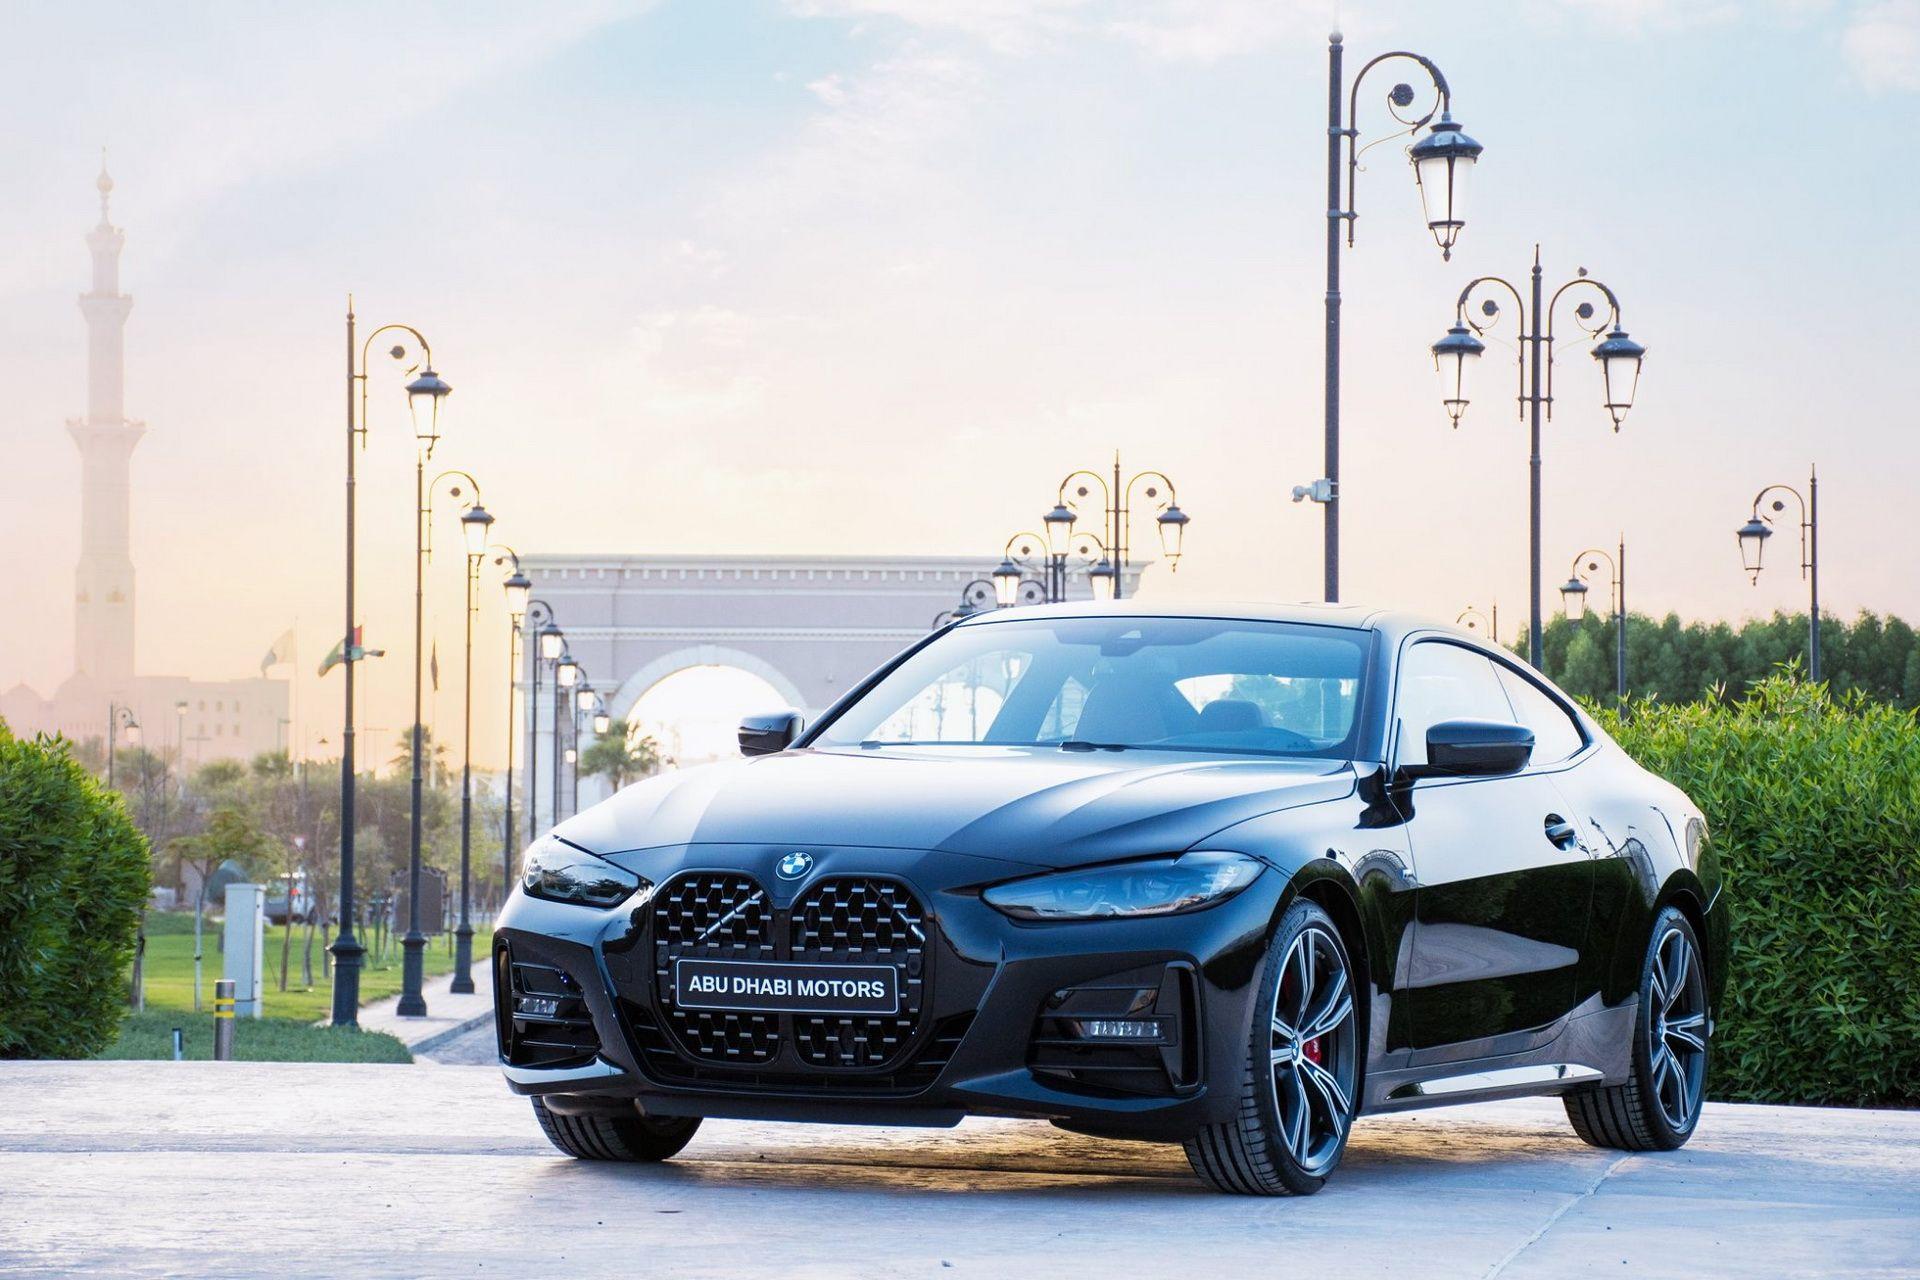 2021_BMW_4-Series_Coupe_Dark_Edition_UAE_0001